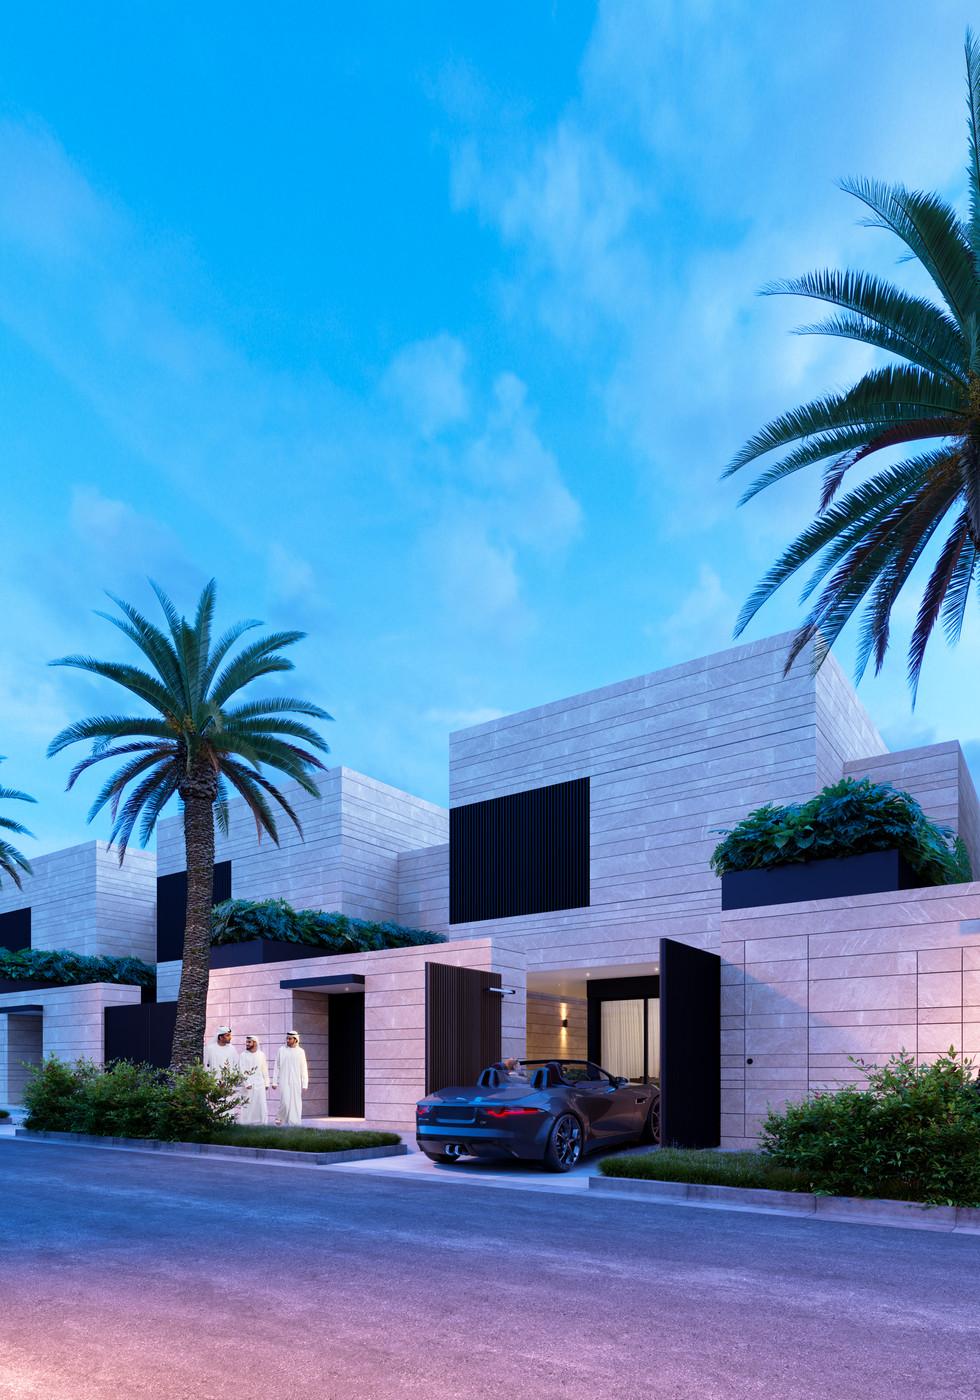 ID-C51_MARISSA VILLAS TOWN HOUSES_Exteri